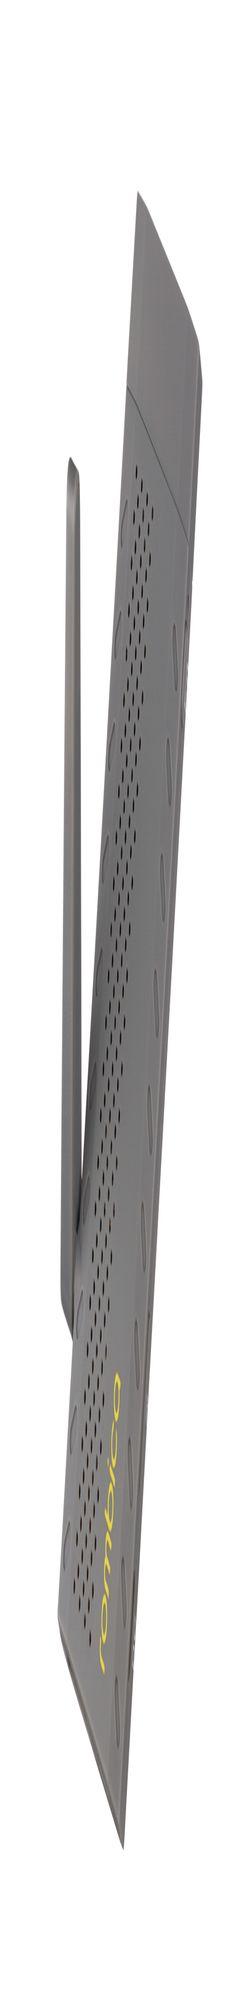 Медиаплеер Rombica Smart Stick Quad v001 фото